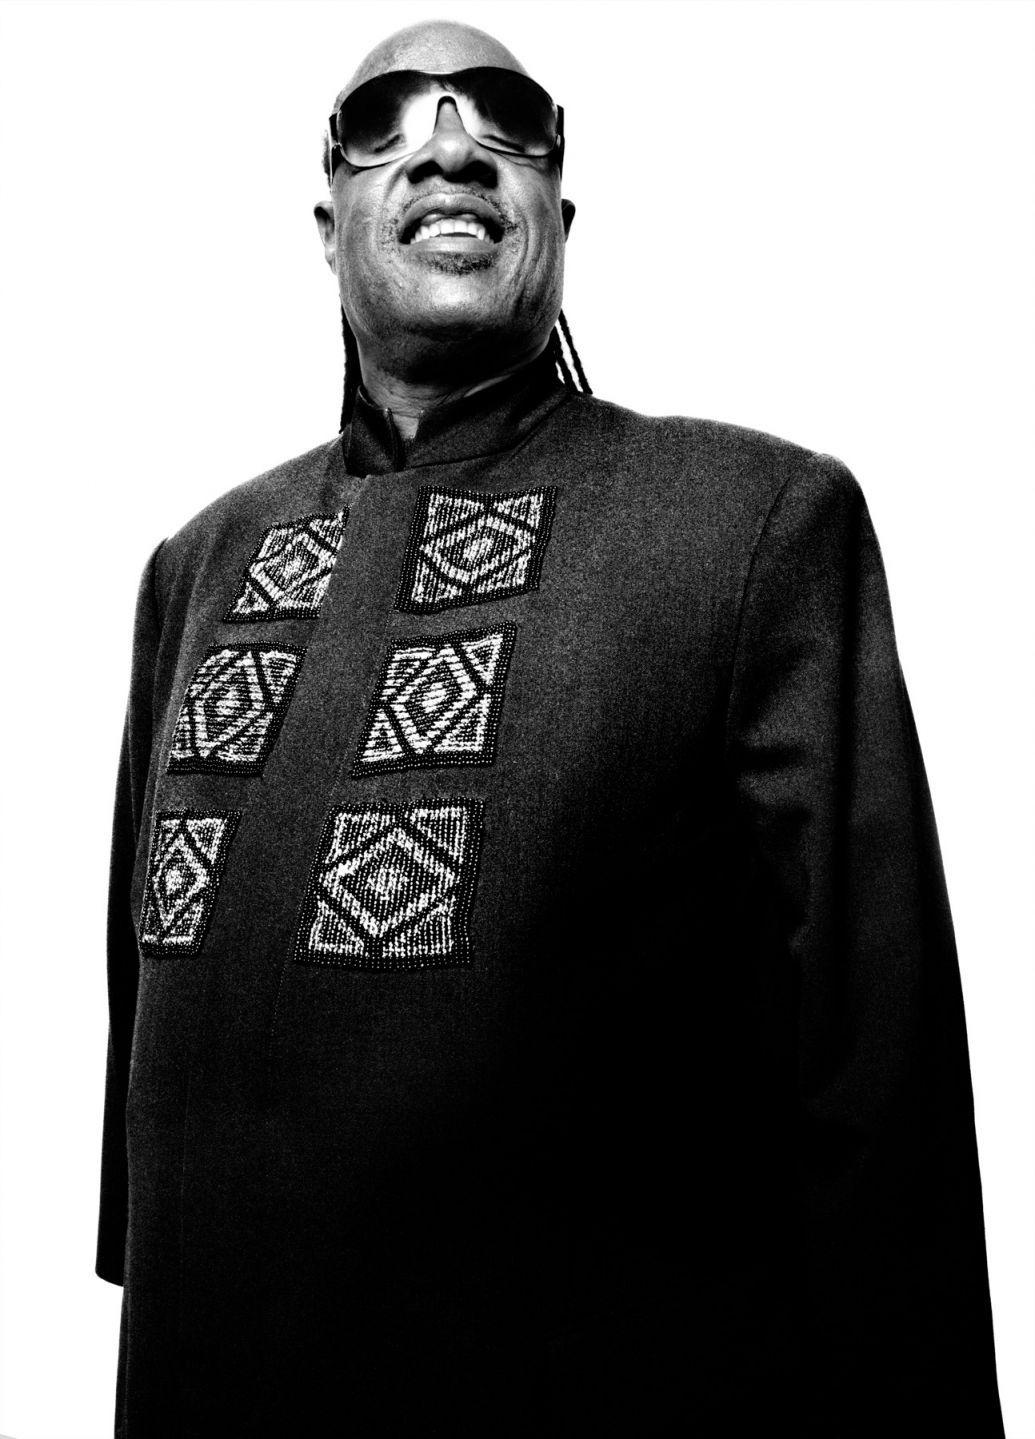 Stevie Wonder by Platon | Black music artists, Black and ...